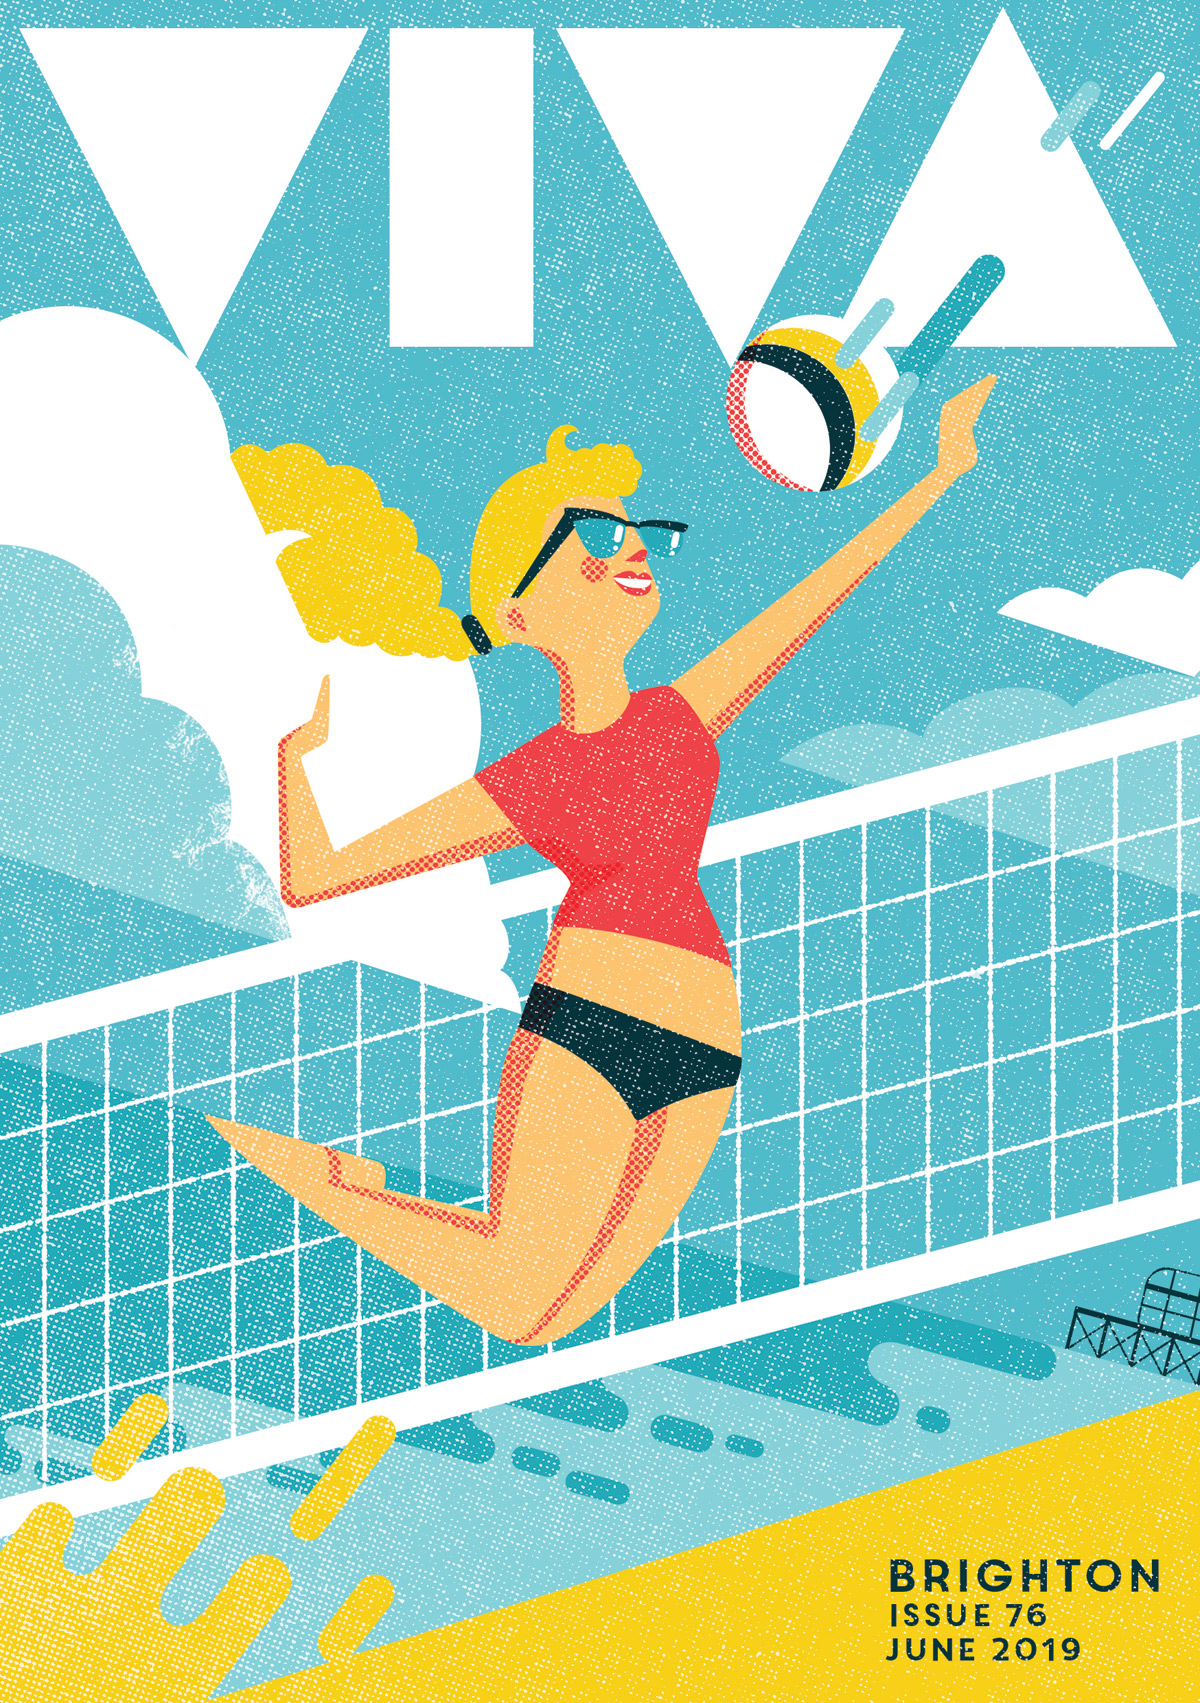 Viva Brighton magazine cover